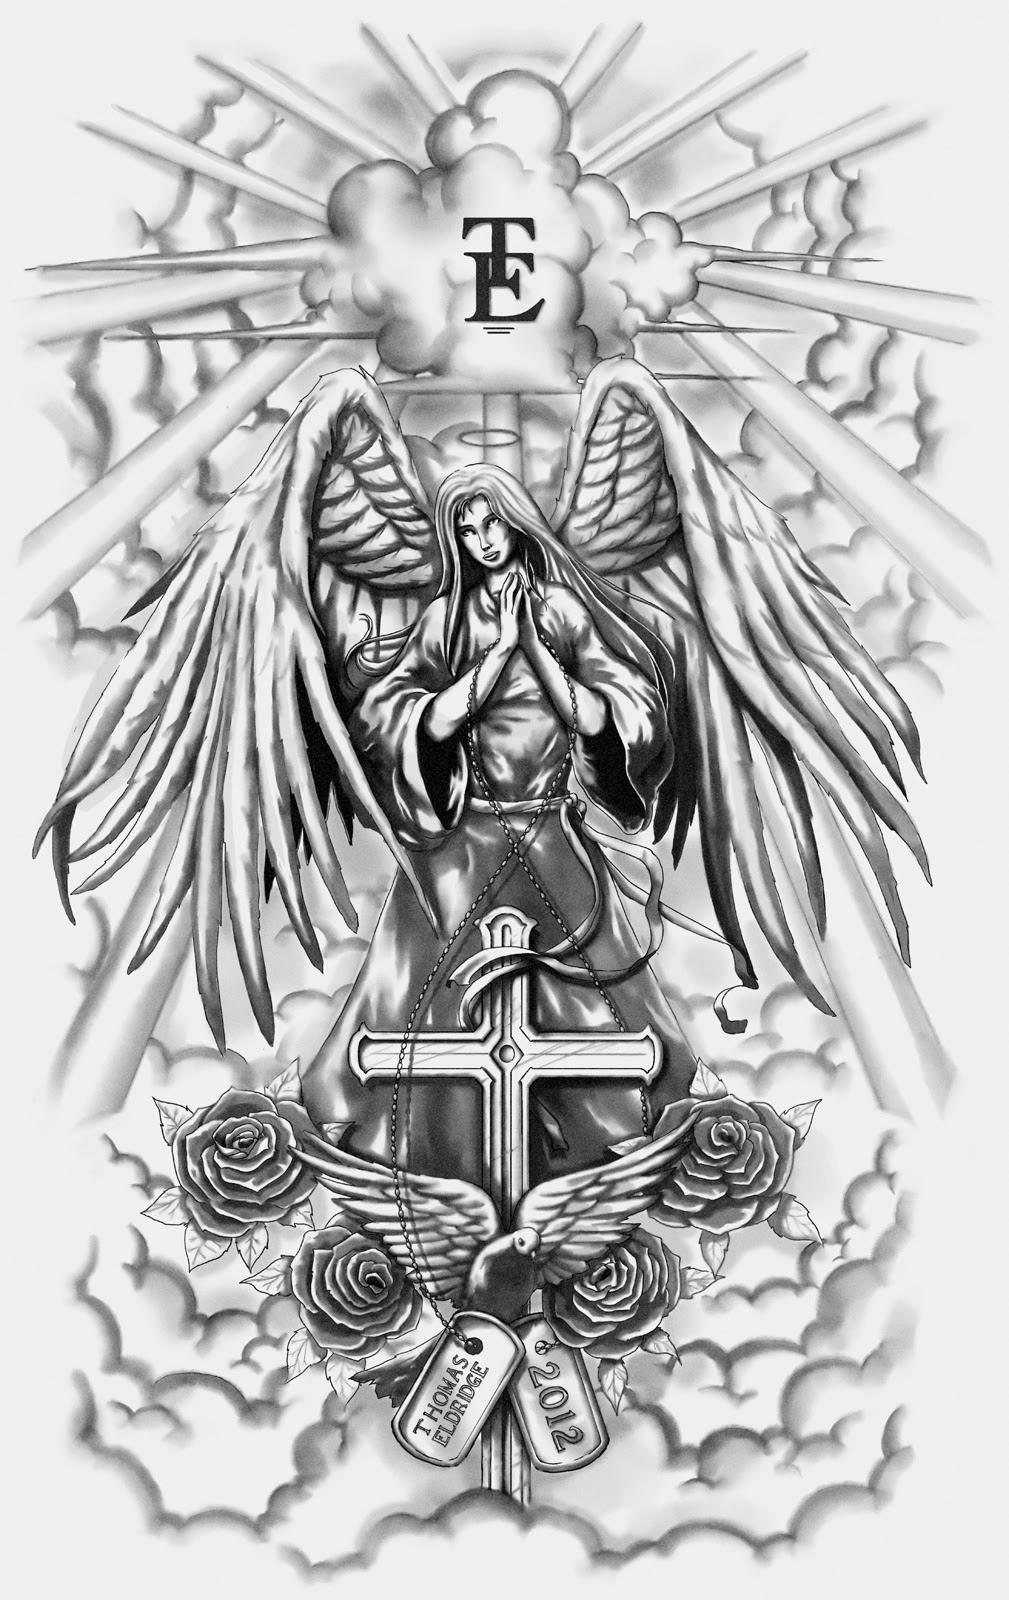 guardian angel full sleeve tattoo by crisluspotattoos on deviantart